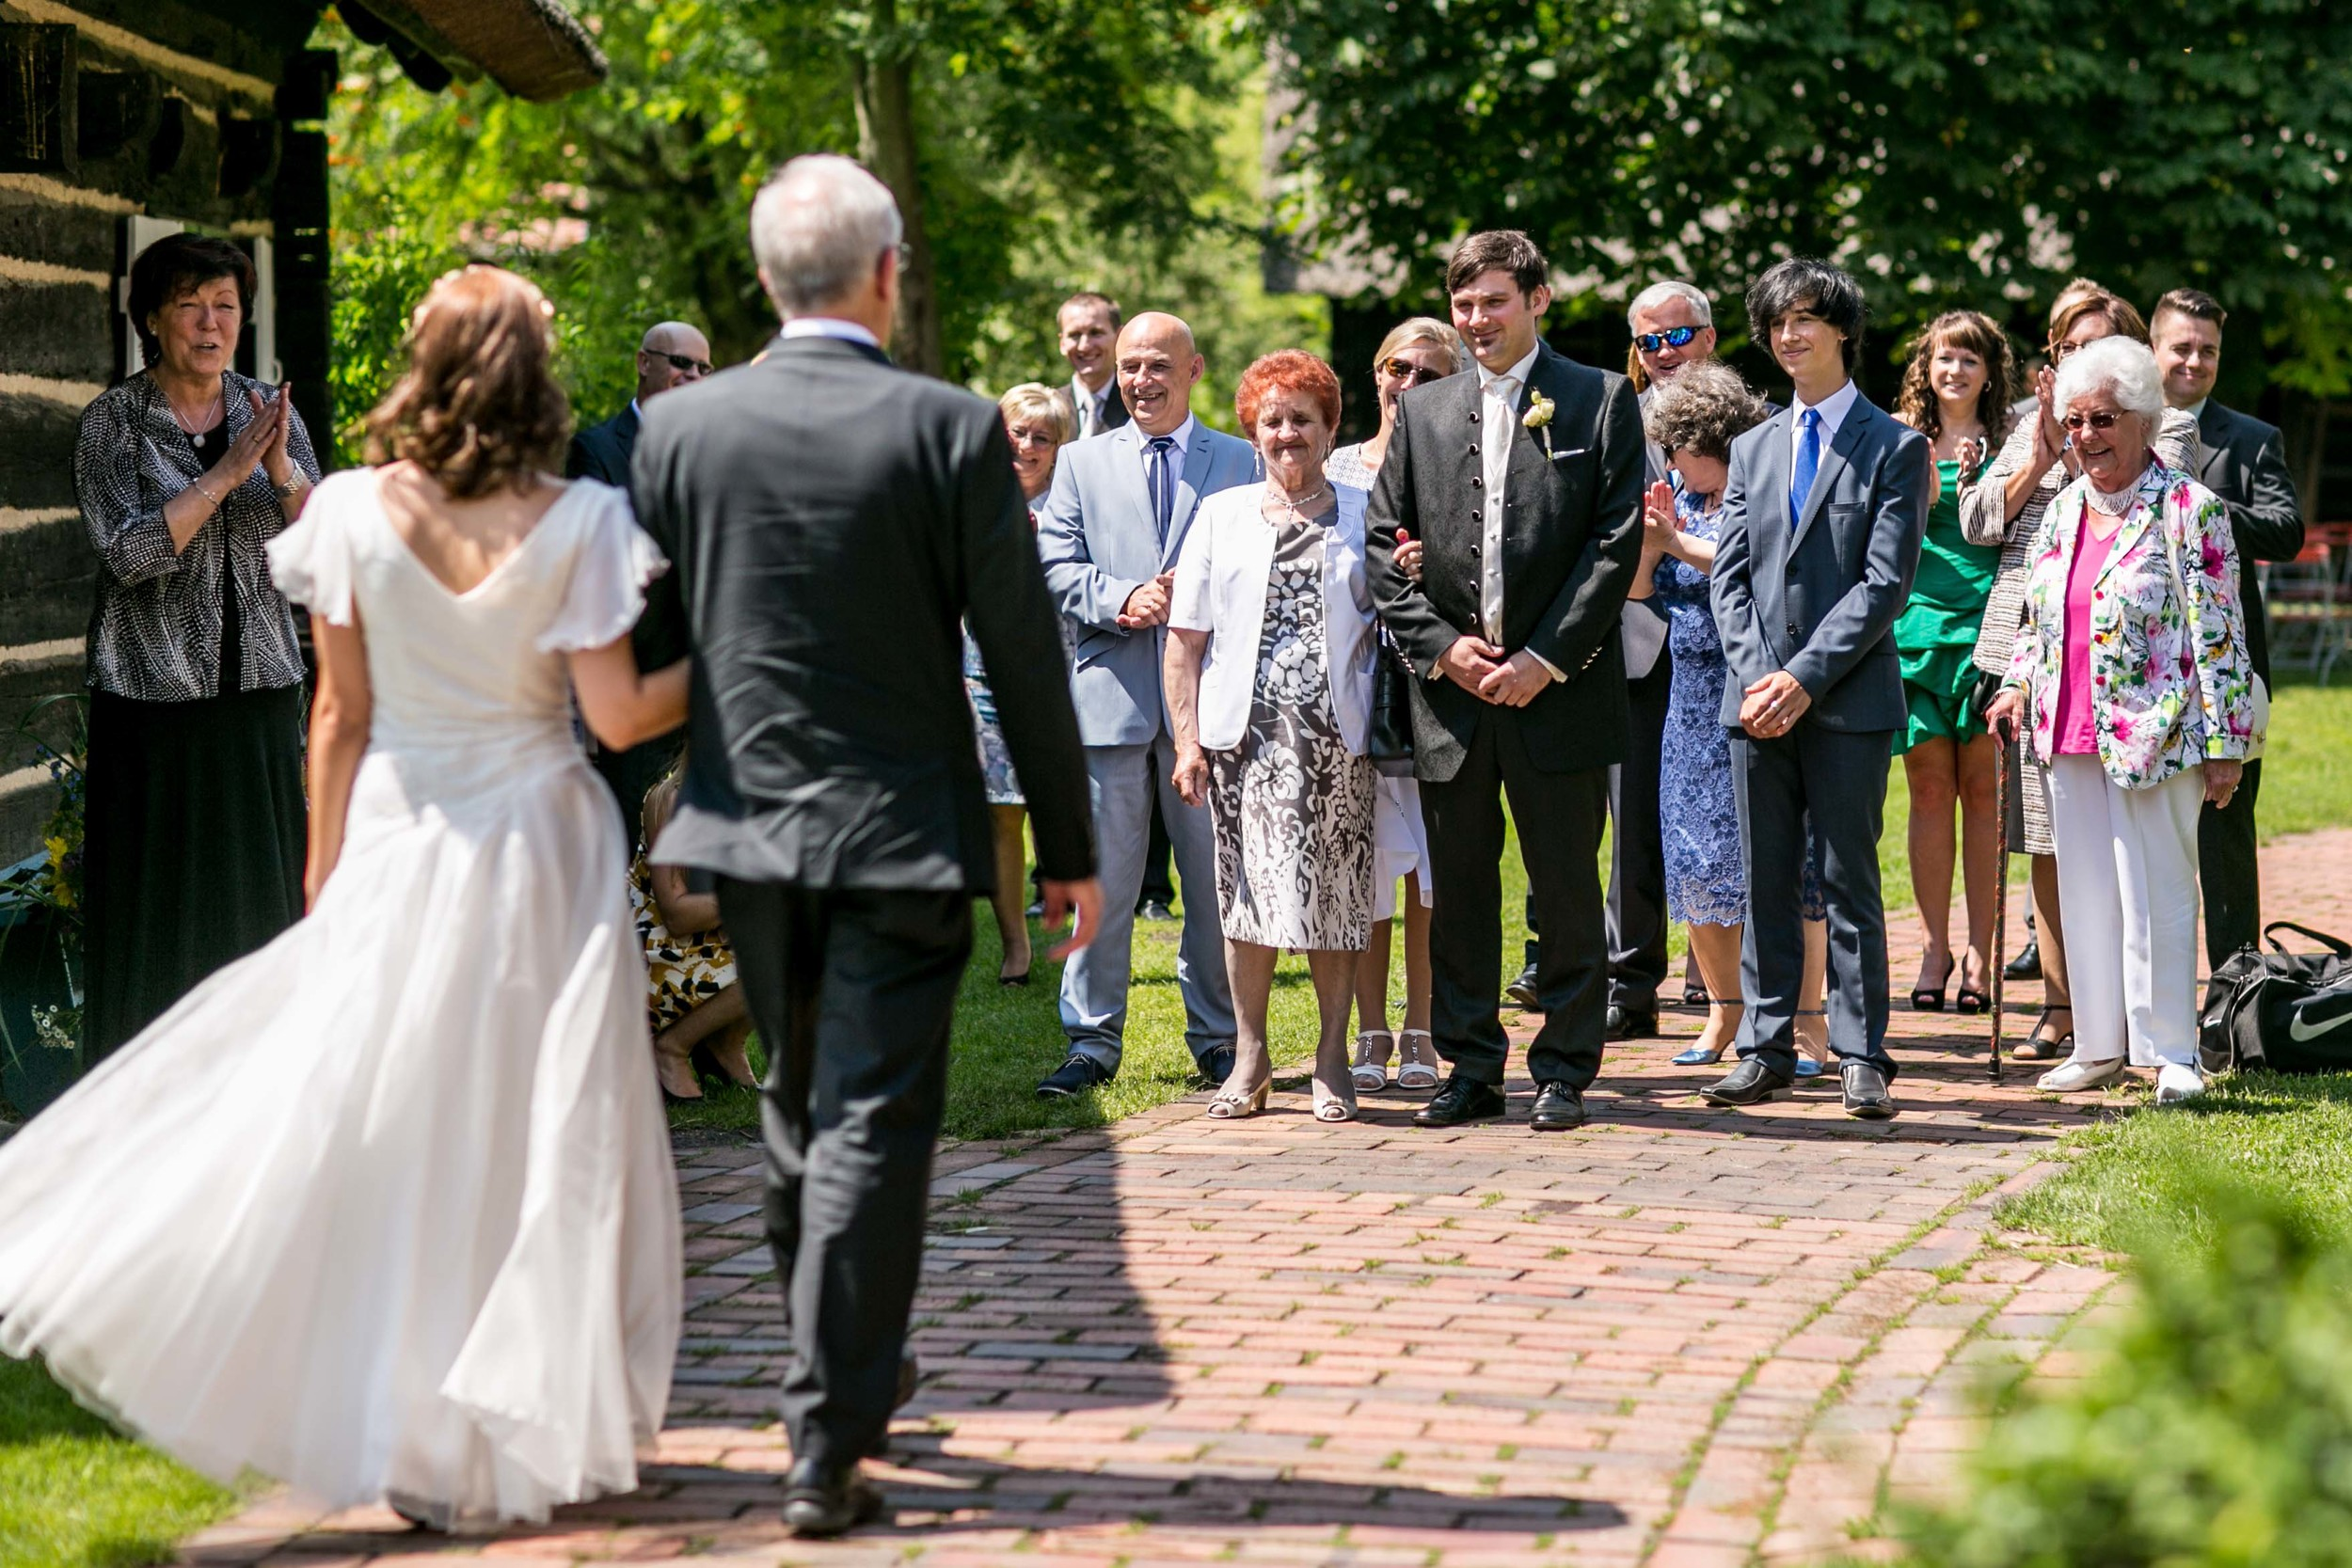 Spreewald Hochzeitsfotografie_Fran Burrows Fotografie-12.jpg